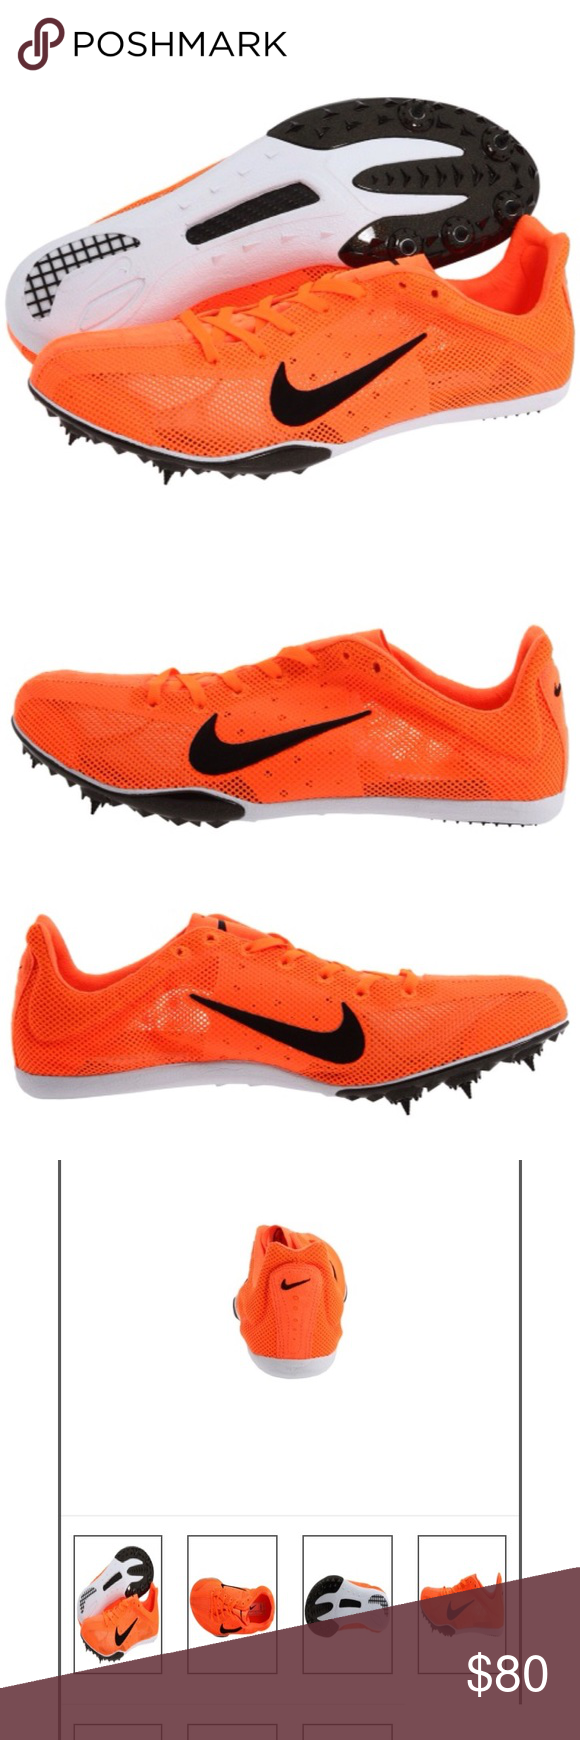 Shop - orange nike track spikes - OFF